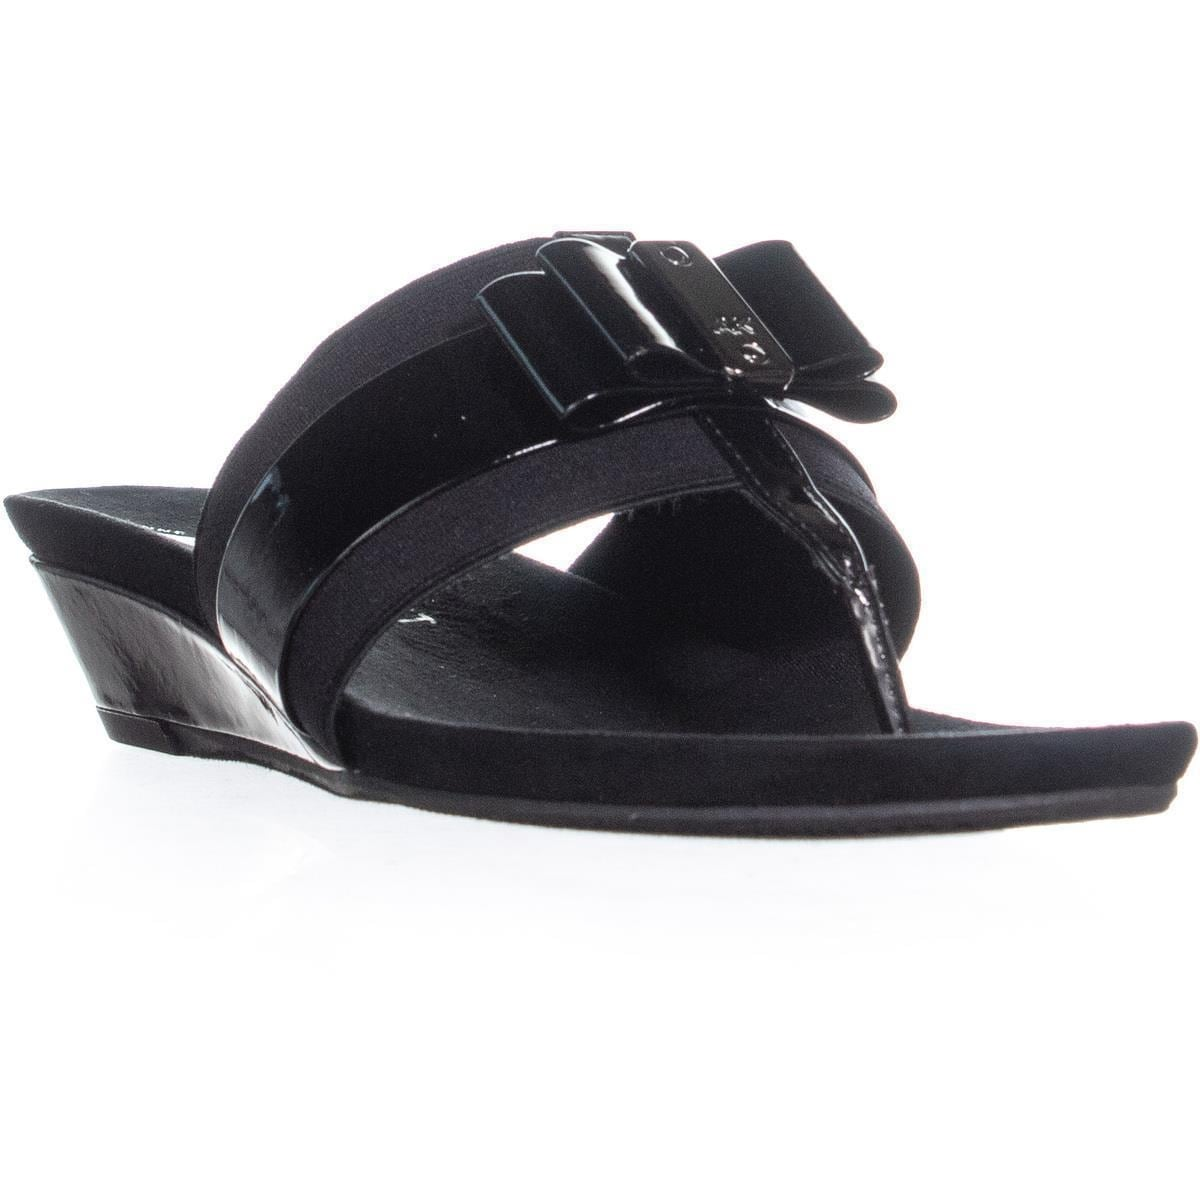 d873b2df121ca Shop Anne Klein Imperial Wedge Slide Slip On Sandals, Black/Black ...